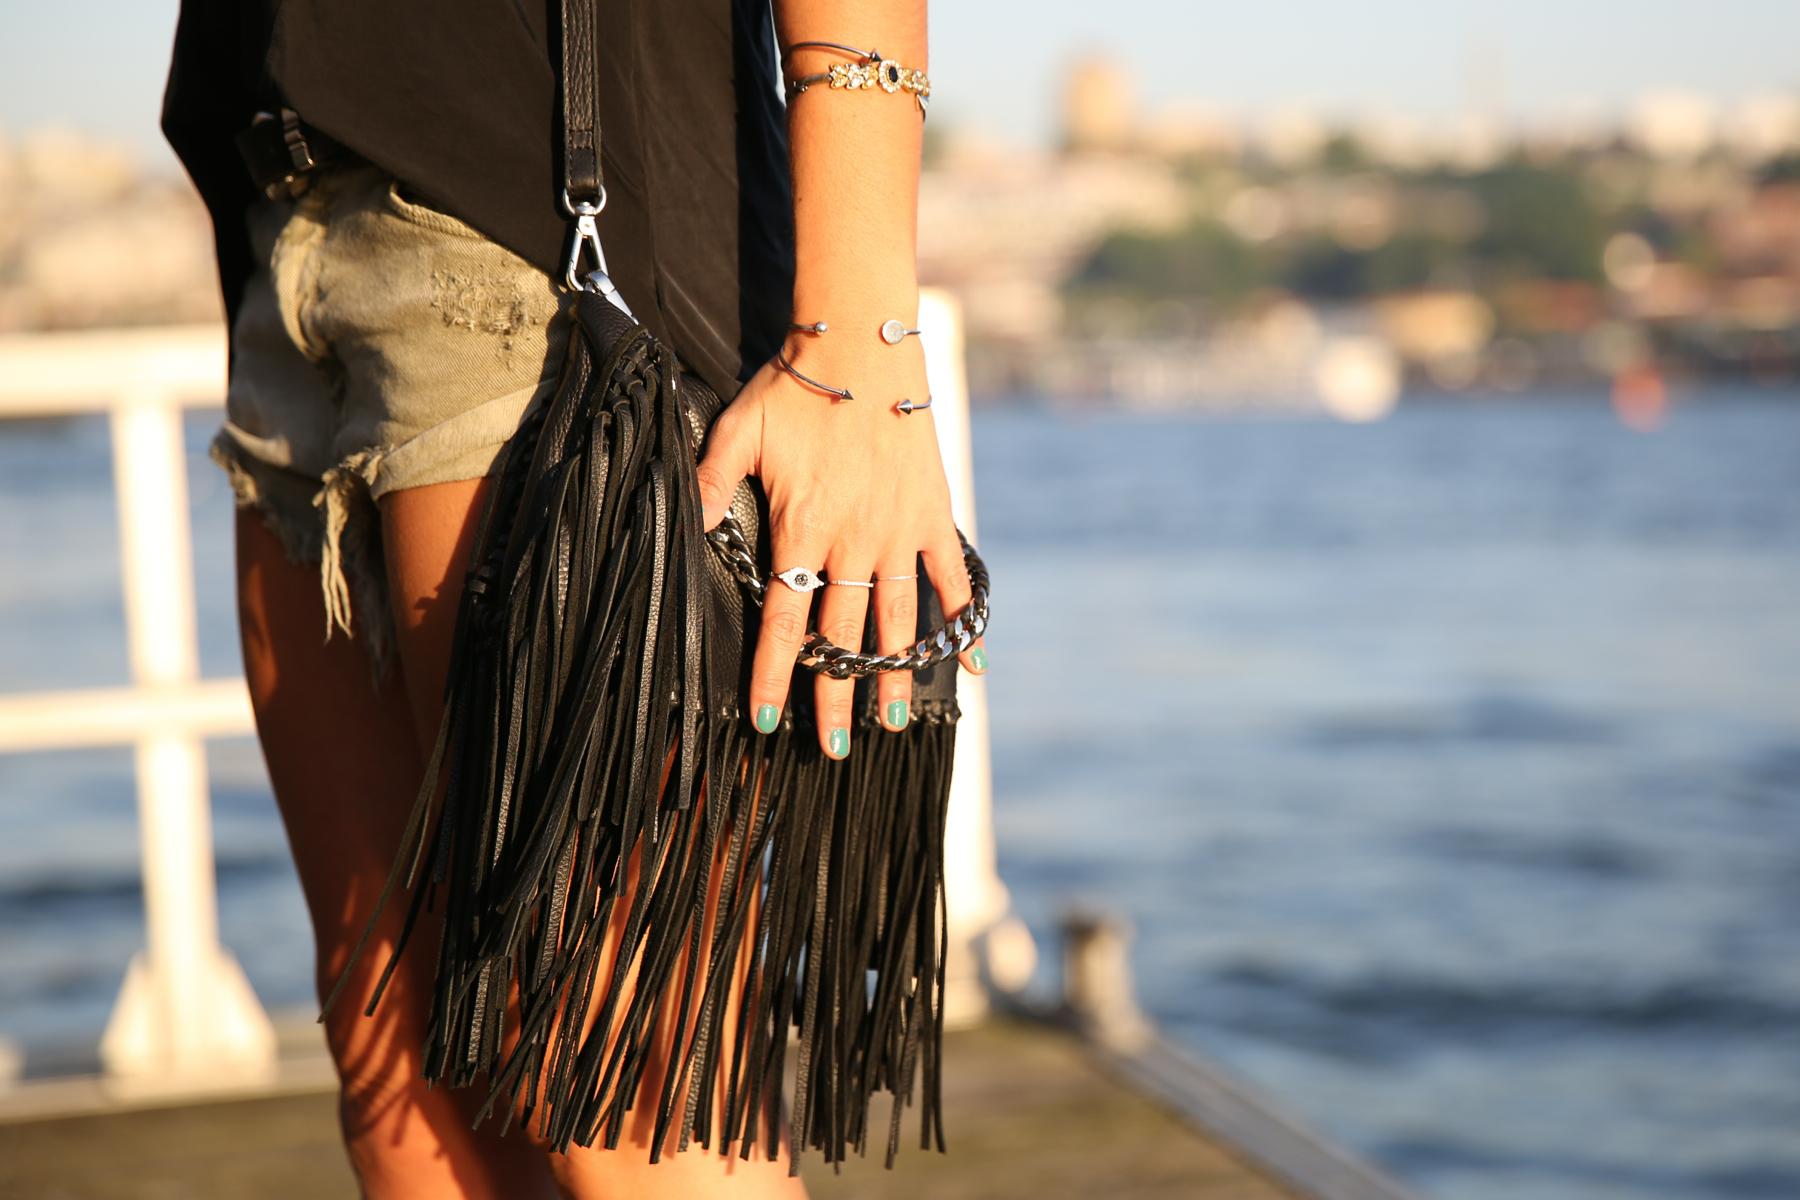 trendy_taste-look-outfit-street_style-ootd-blog-blogger-fashion_spain-moda_españa-salsa_jeans-dior_gafas-bolso_flecos-fringes_bag-khaki_shorts-shorts_caqui-grey_tee-camiseta_gris-verano-porto-portugal-5